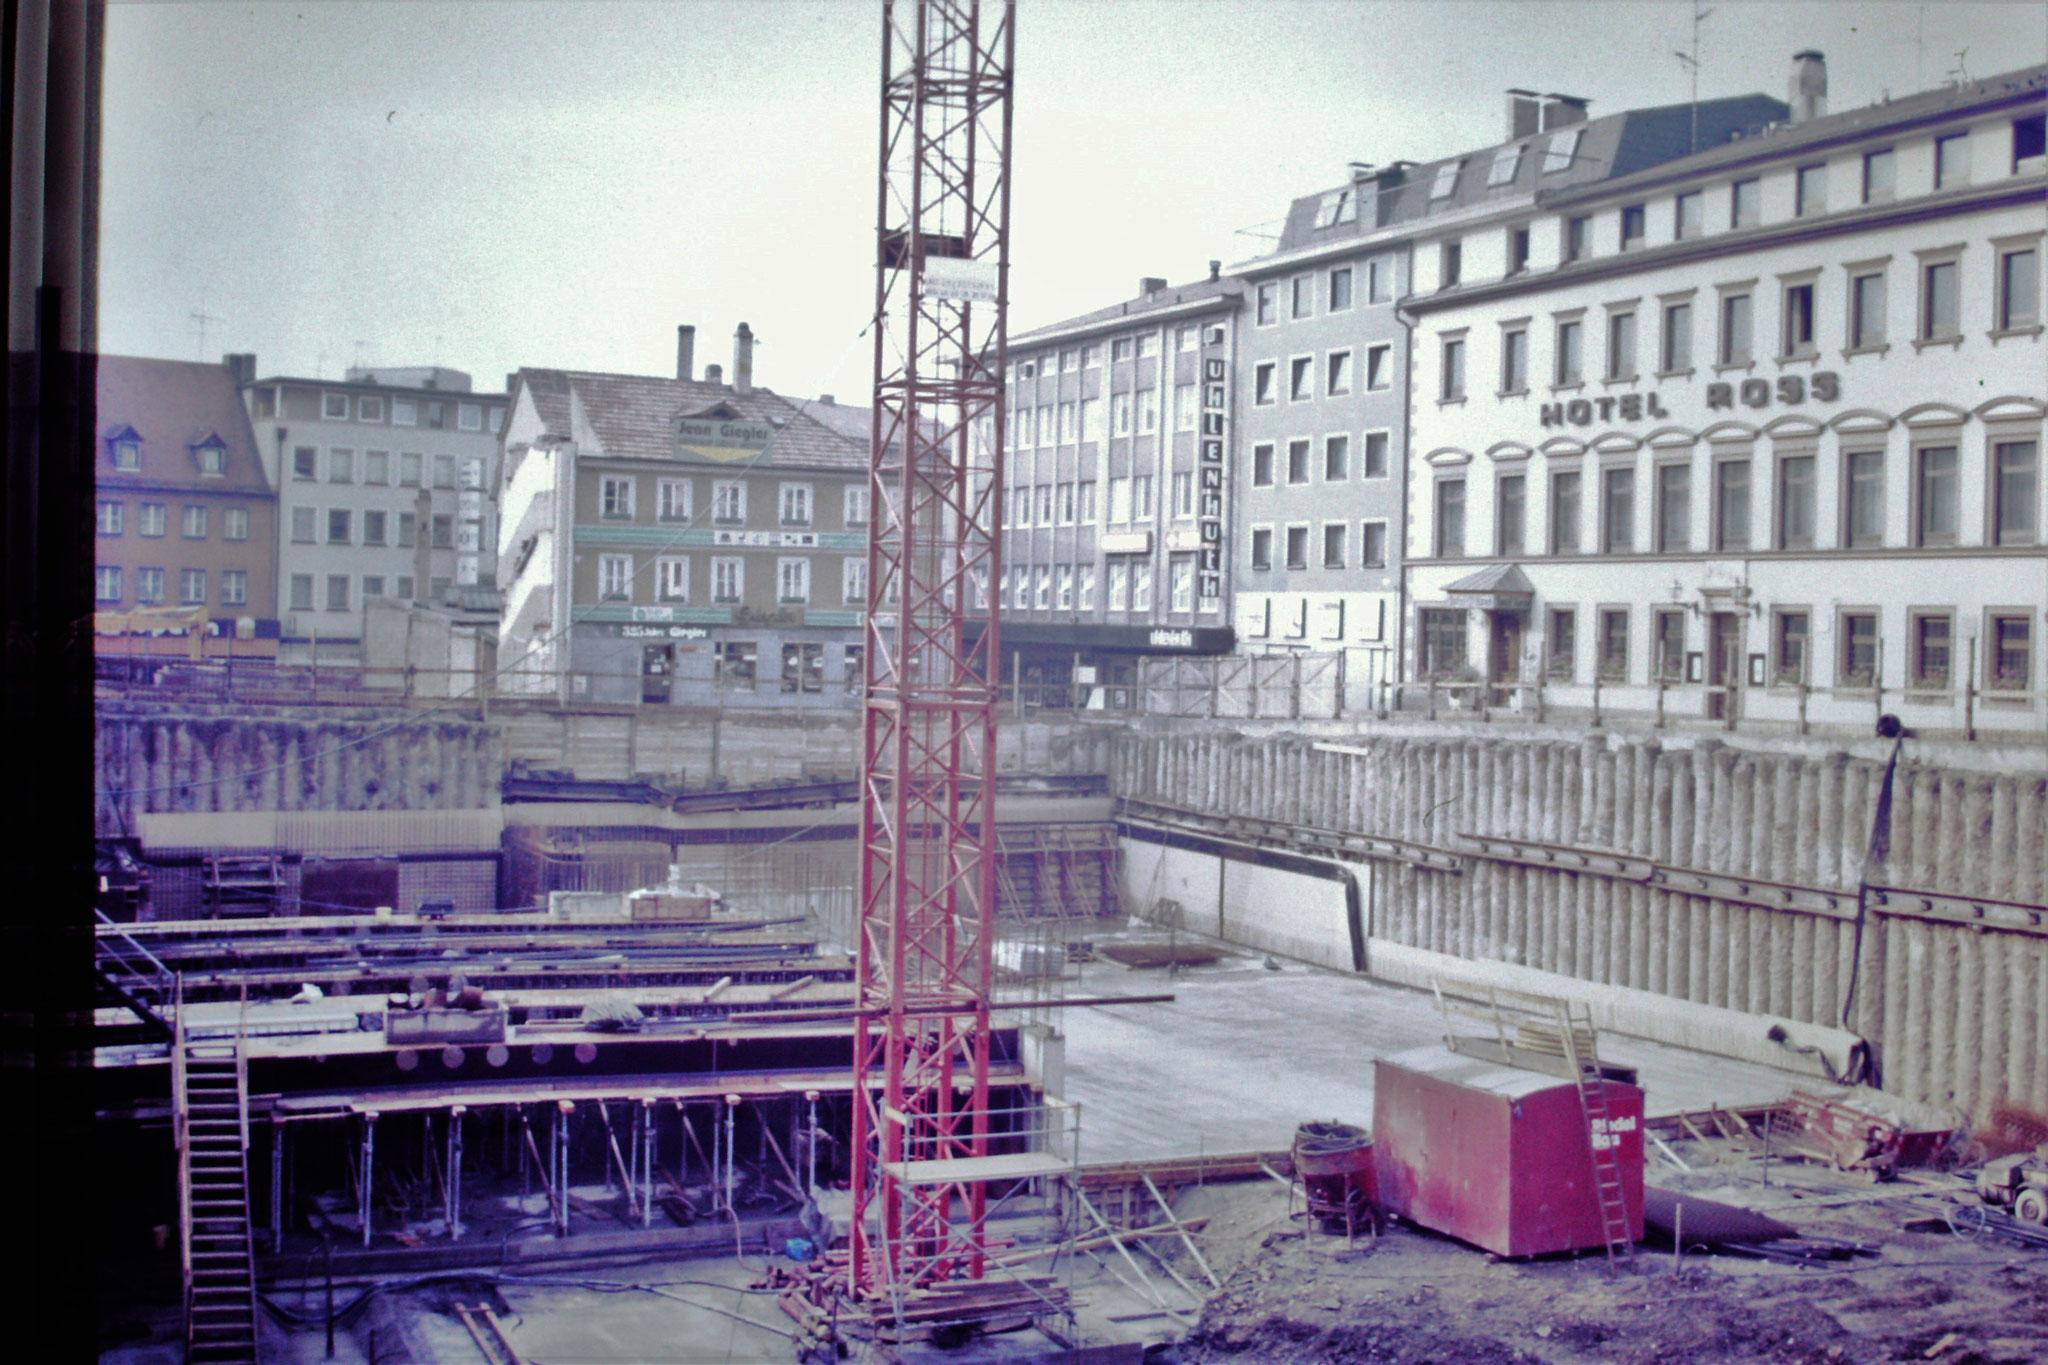 1986 - Tiefgaragenbau